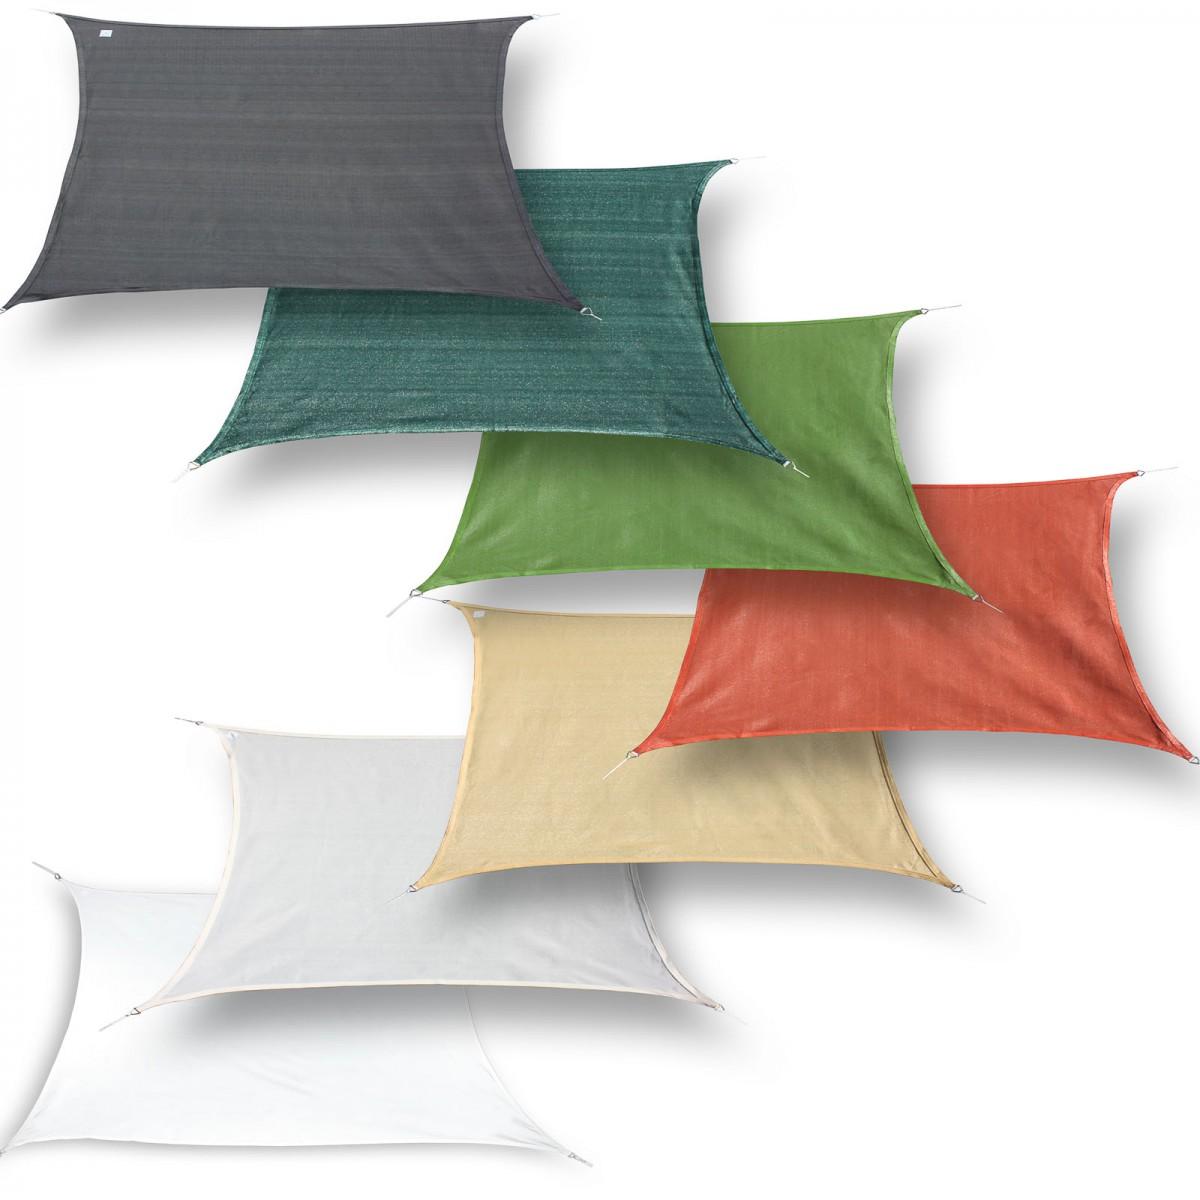 sonnensegel rechteck sonnenschutz schattensegel sonnendach. Black Bedroom Furniture Sets. Home Design Ideas